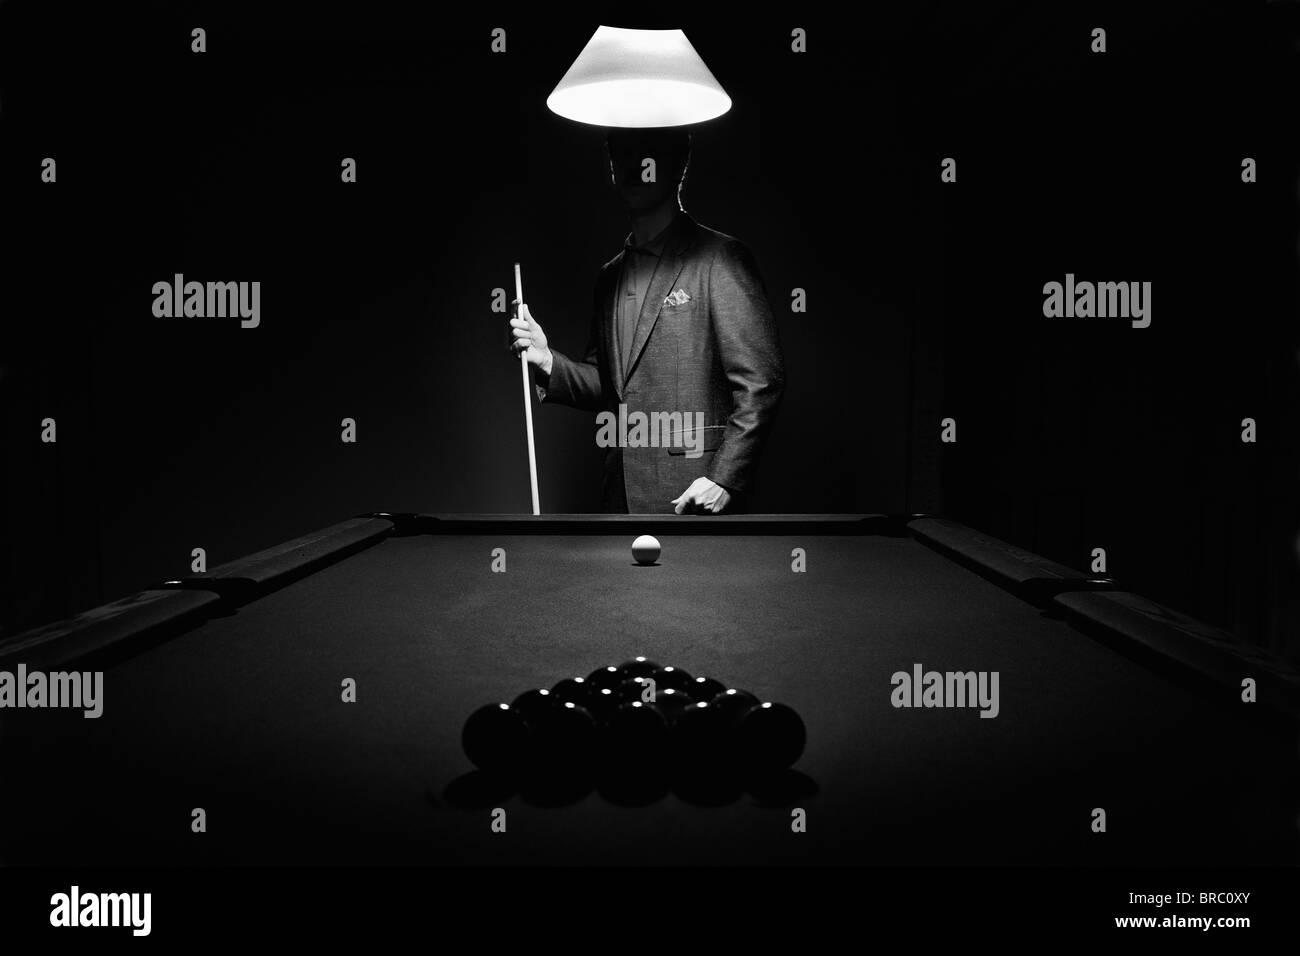 Mystery Pool Player Behind Rack Of Billiard Balls; Edmonton, Alberta, Canada Stock Photo